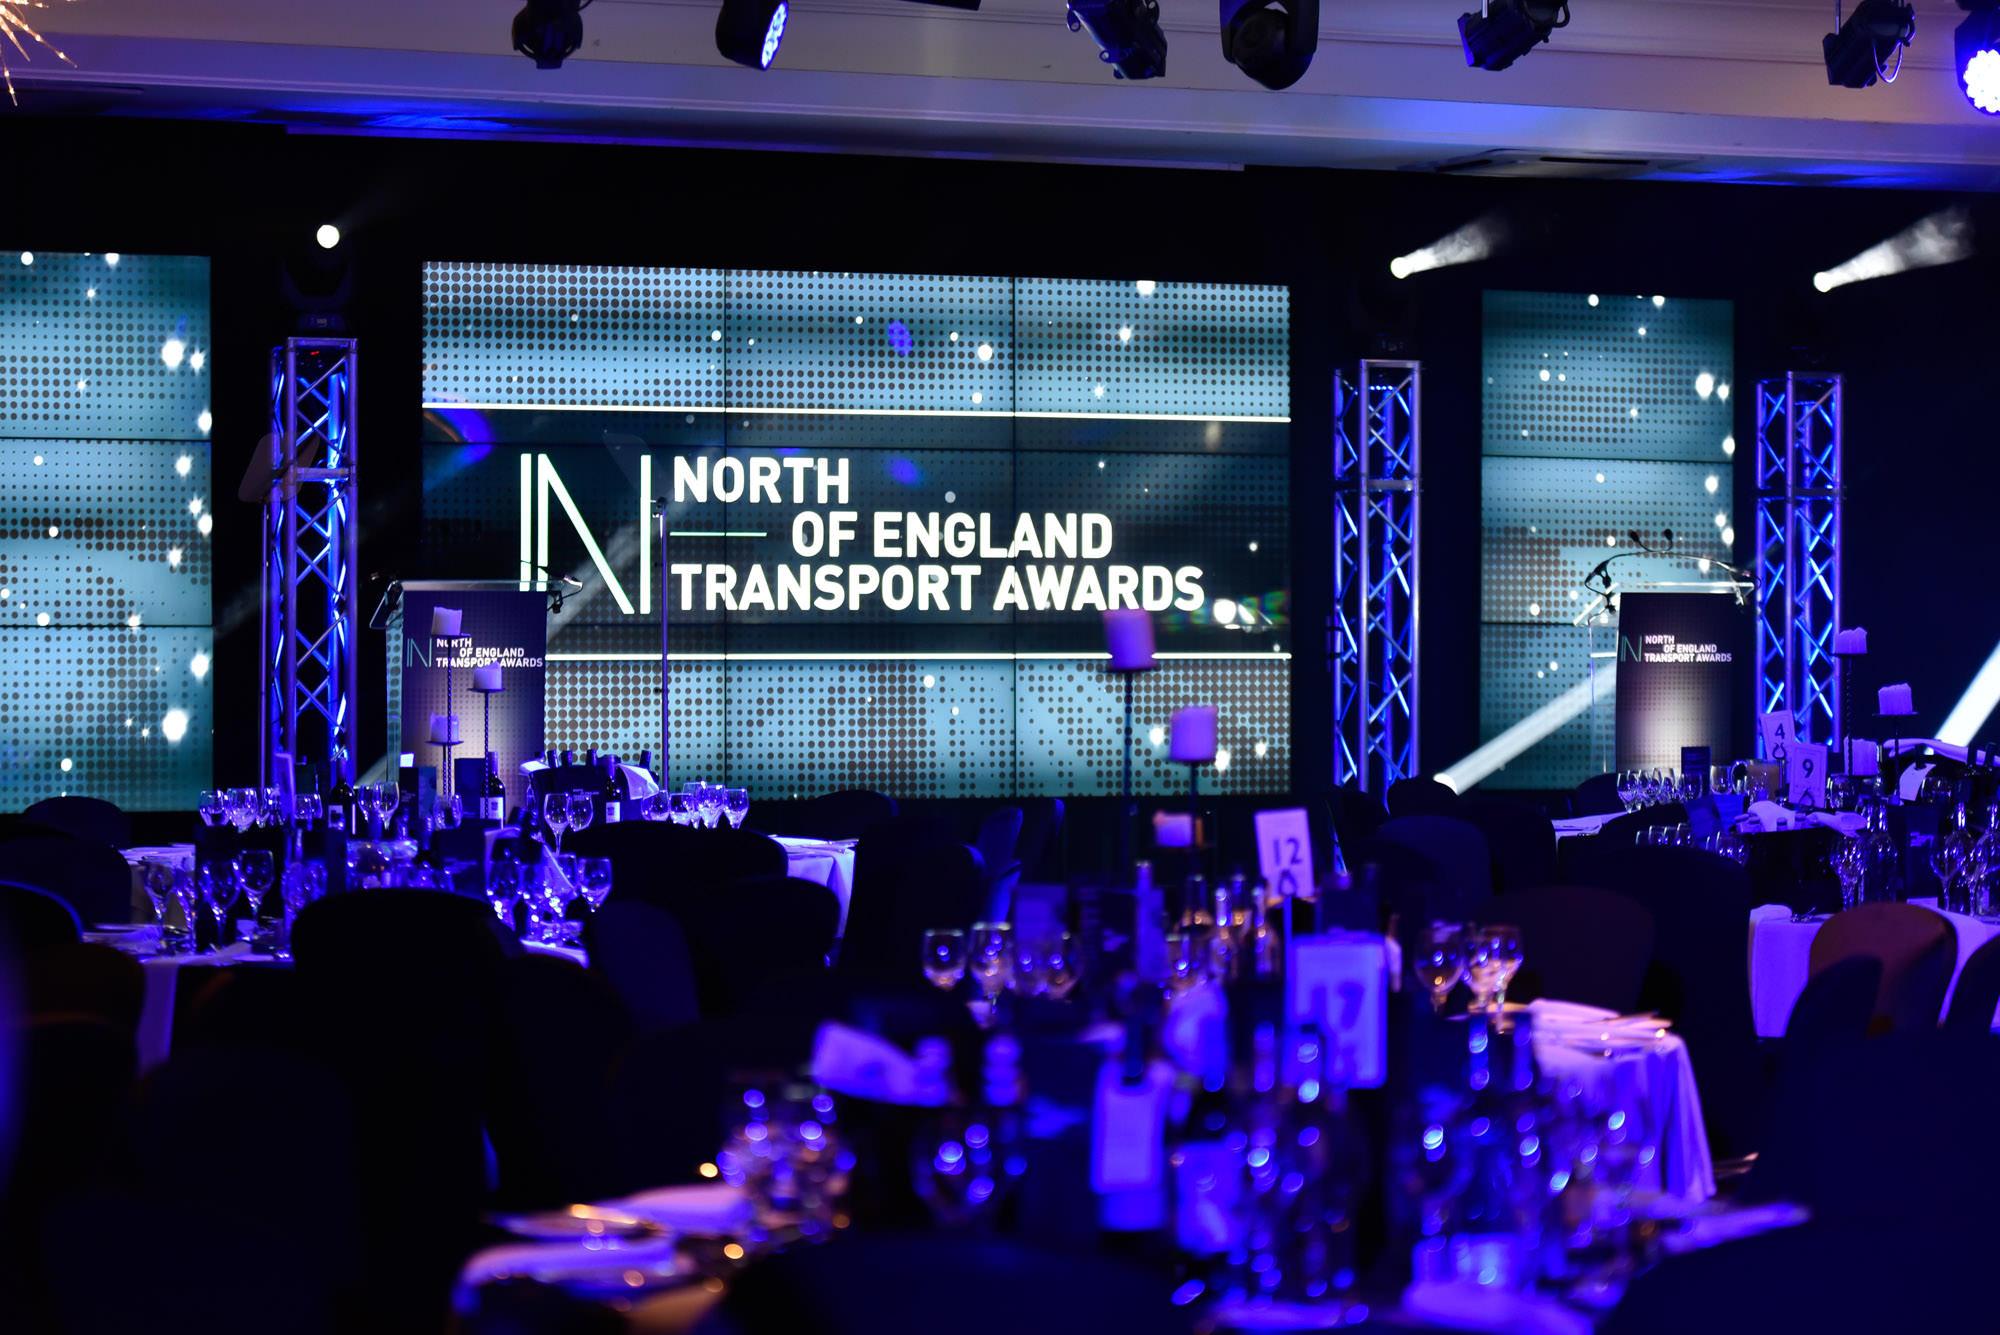 NorthOfEngland_TransportAwards_12.jpg